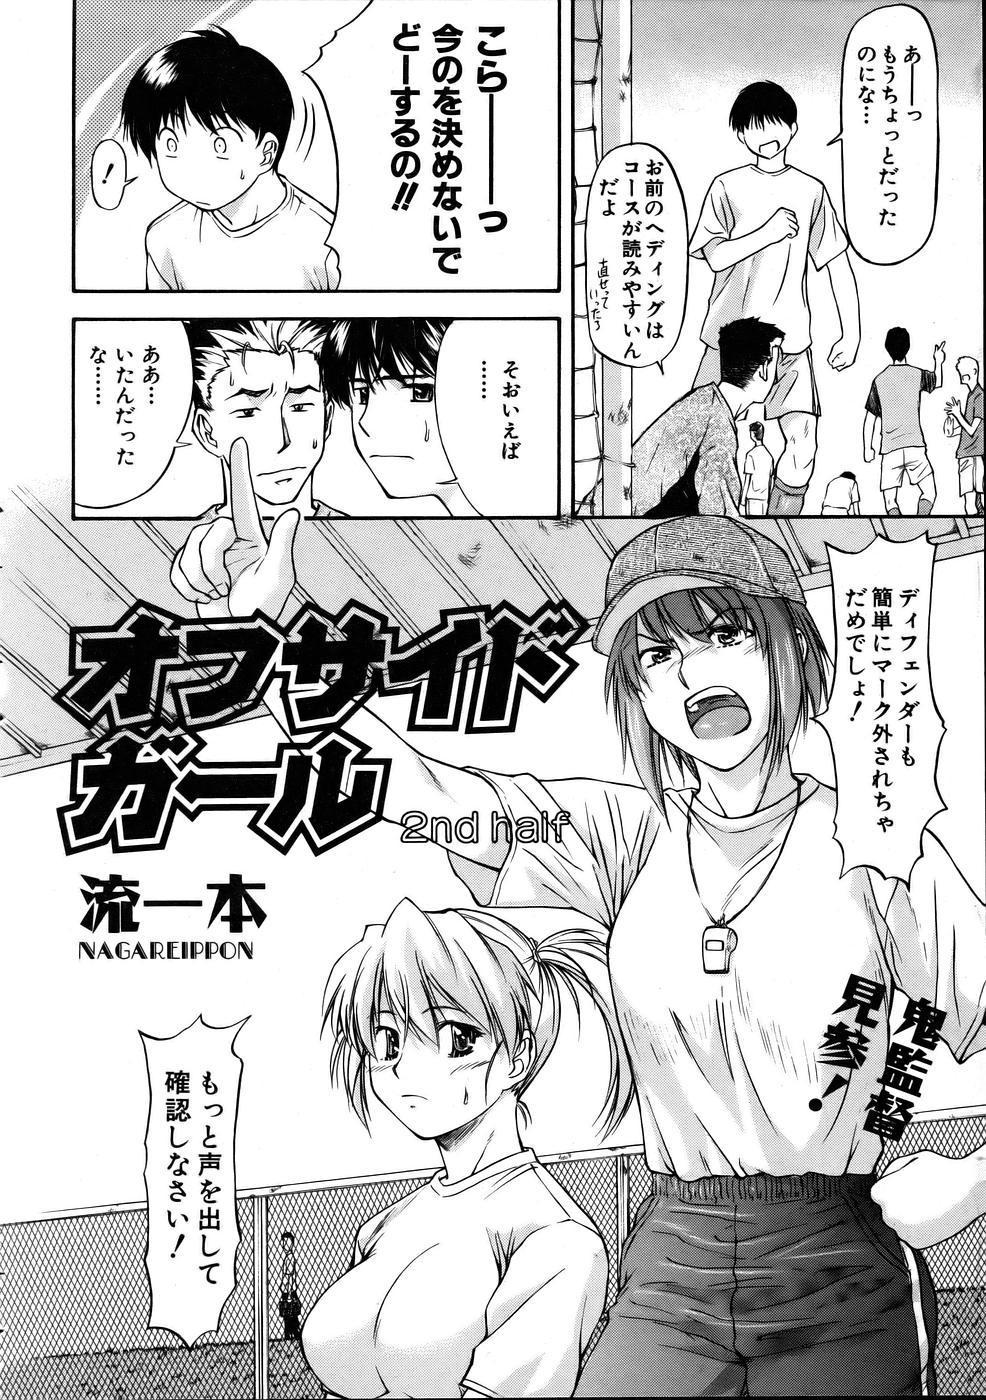 COMIC AUN 2005-10 Vol. 113 81